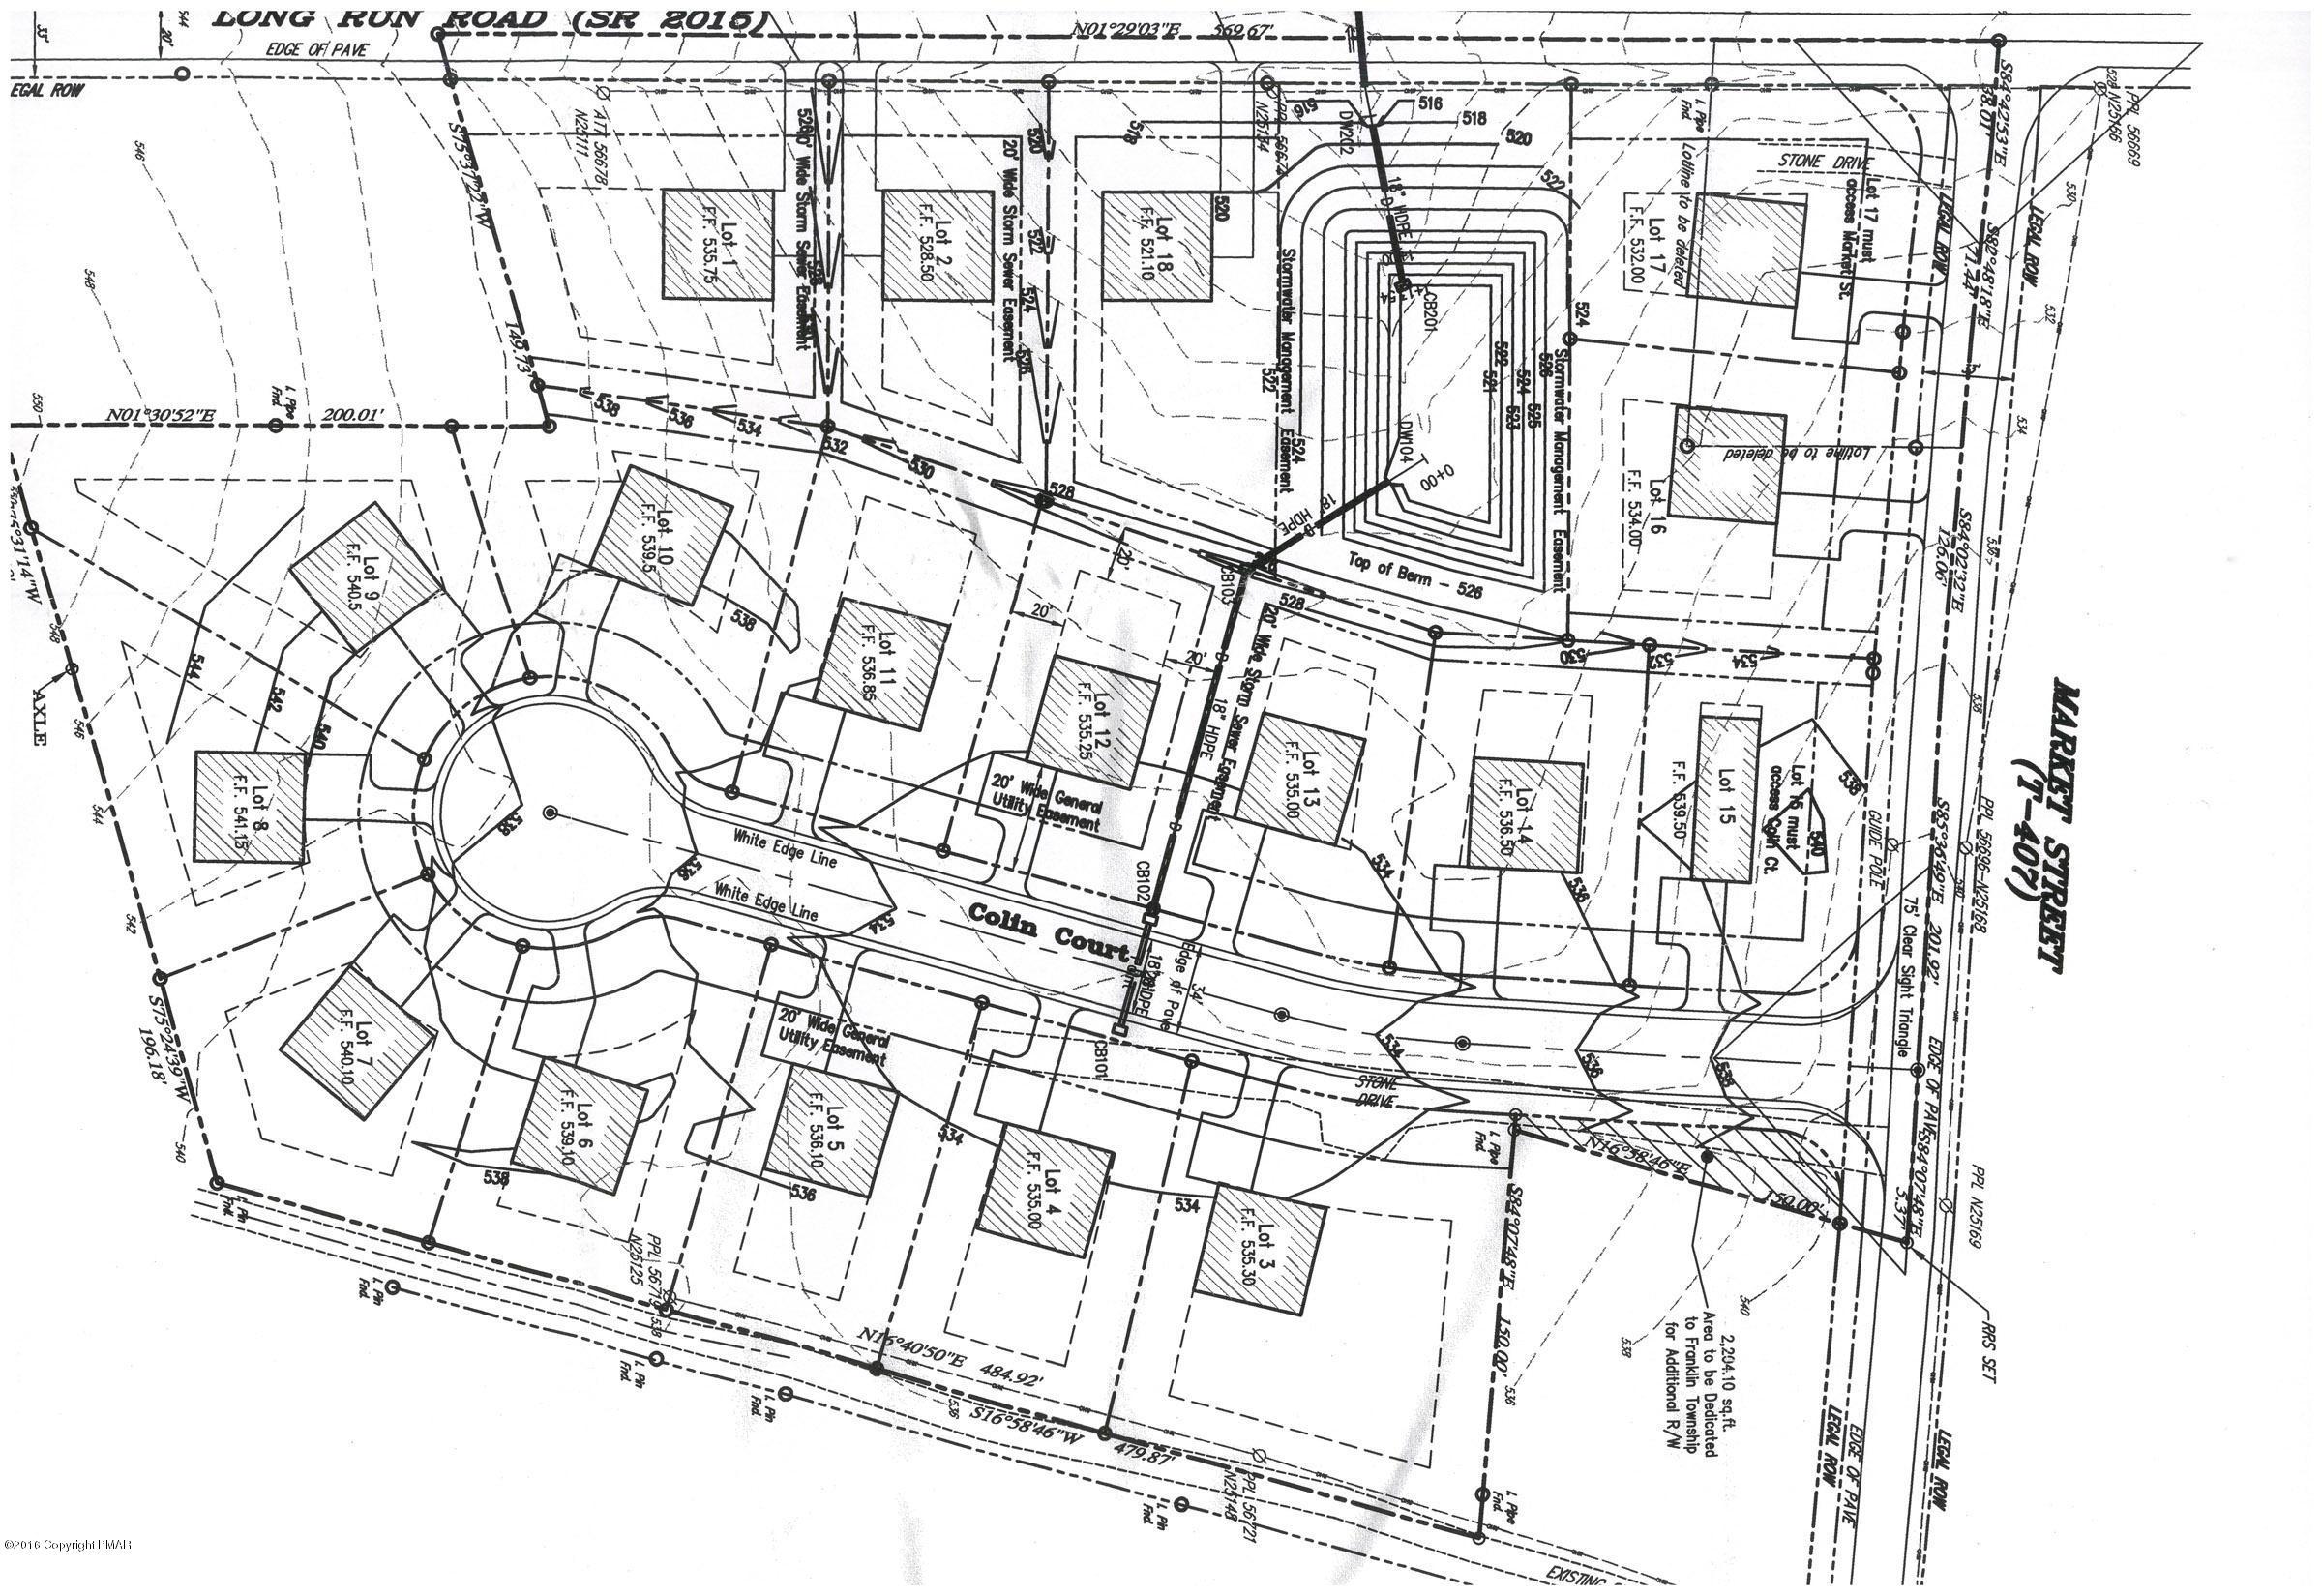 Market St. And Long Run Rd, Lehighton, PA 18235